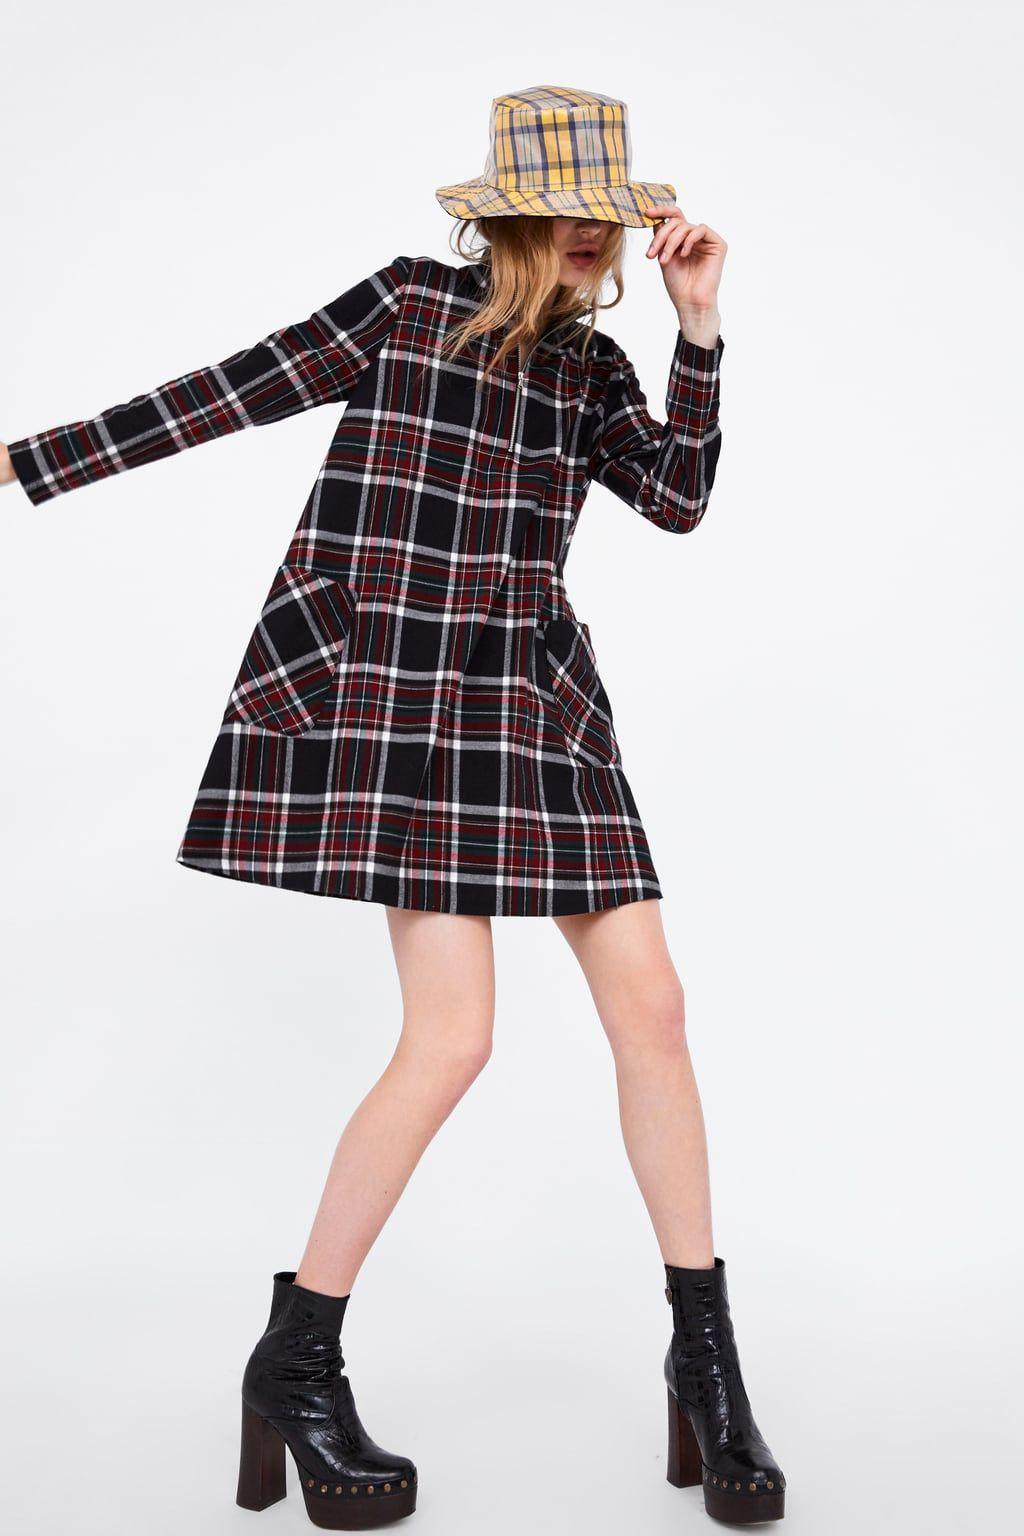 Vestido Cuadros Kariertes Kleid Kleider Damen Modestil